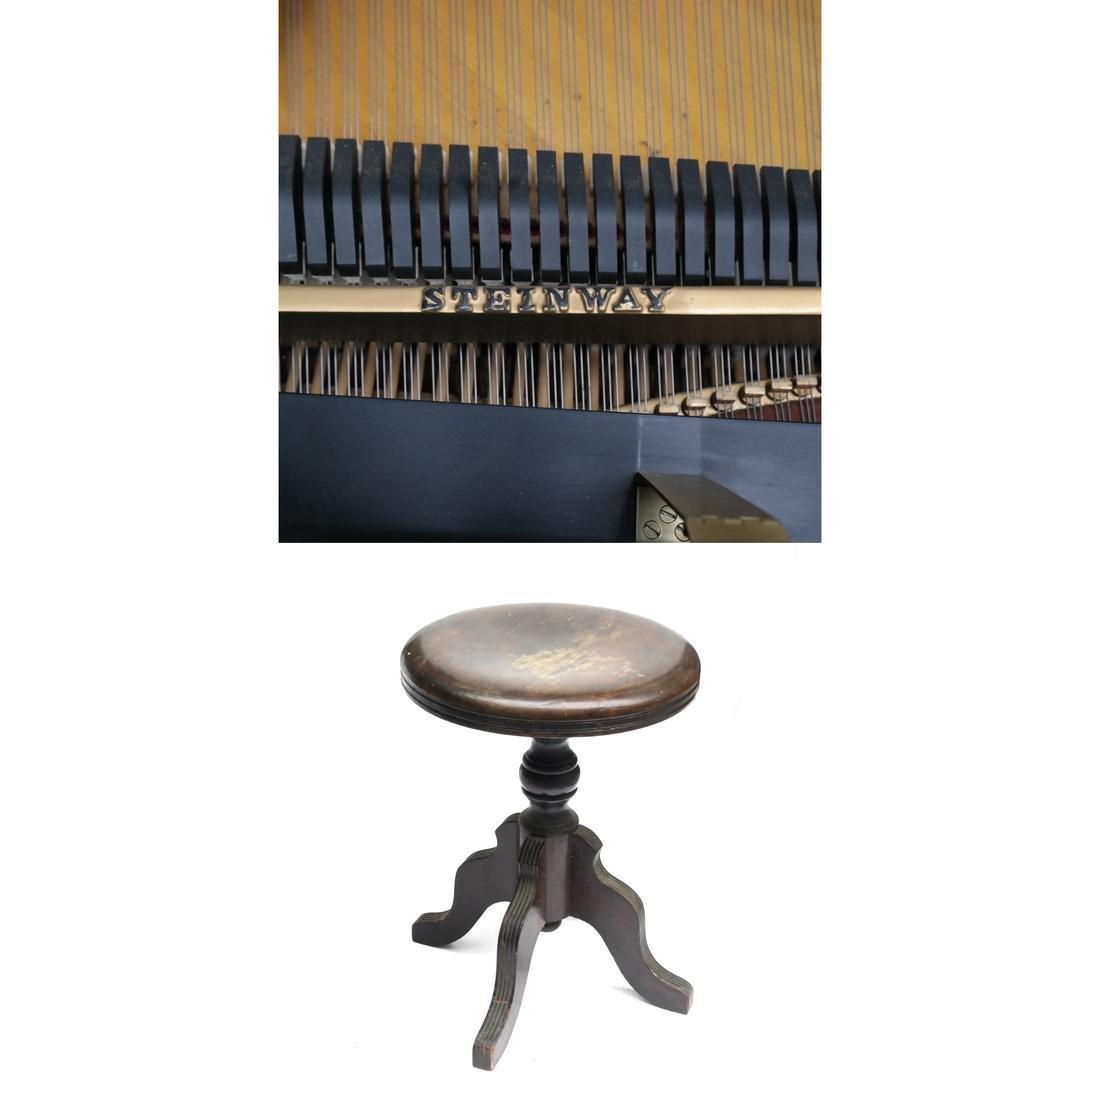 Steinway & Sons Studio Grand Piano, Model 404061 M - 10